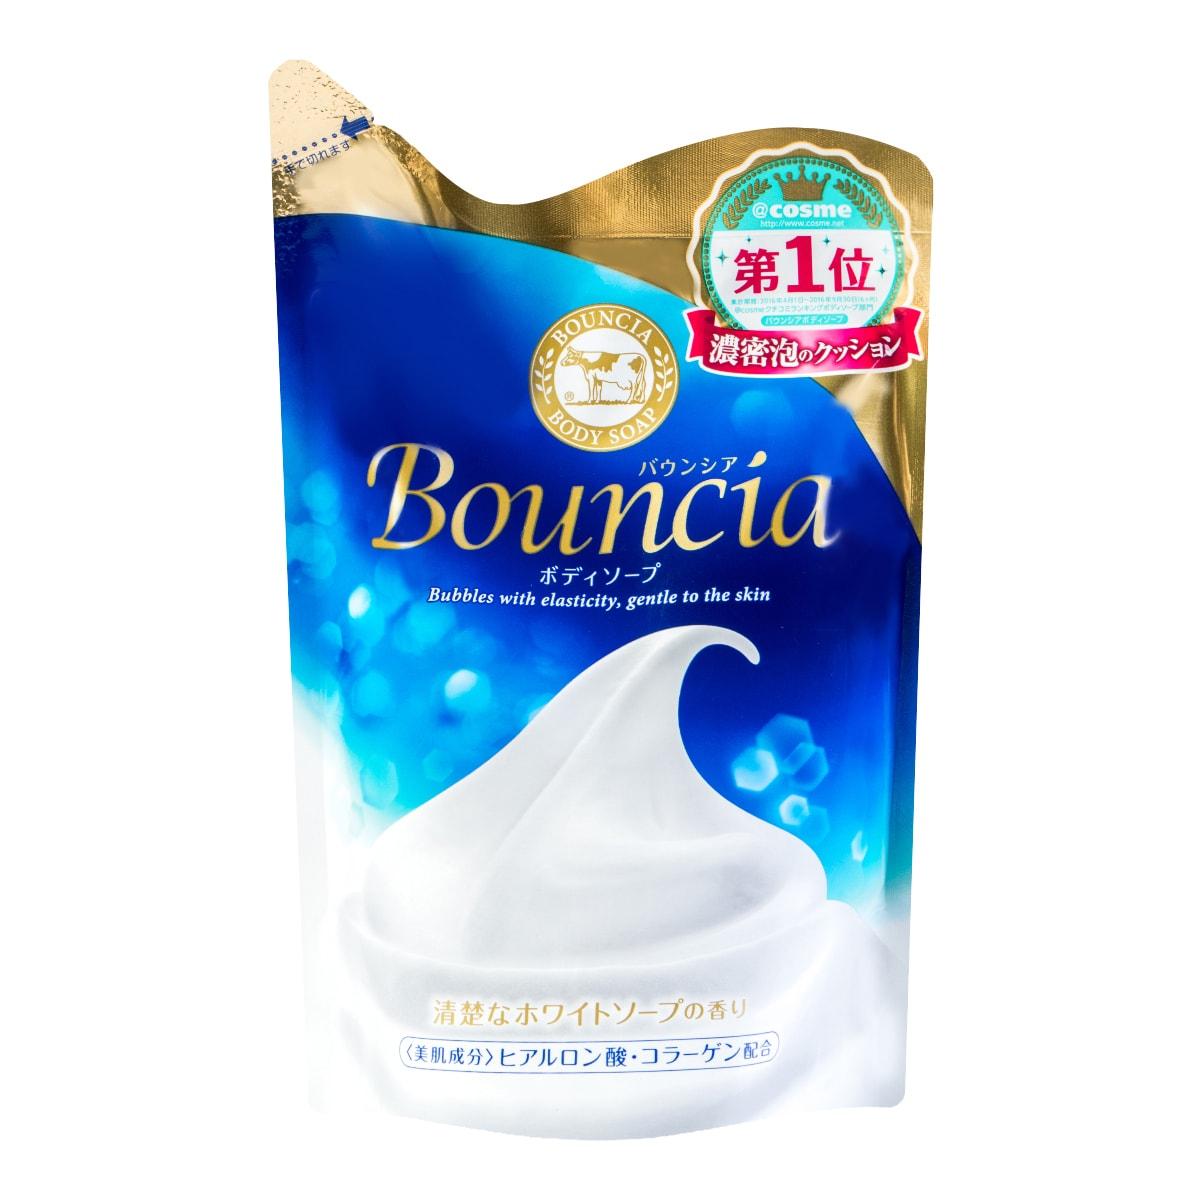 COW BOUNCIA Body Wash Refill 430ml